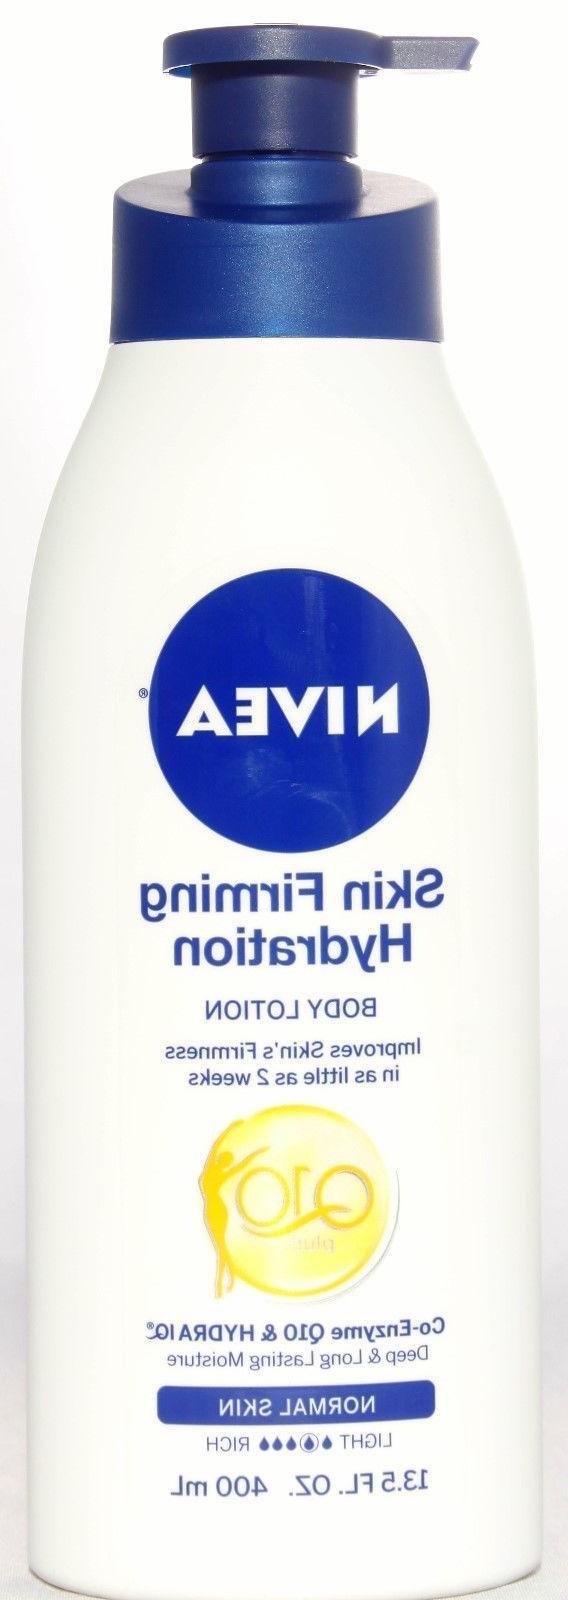 Nivea Skin Firming Body w/ Q10 for Skin 13.5oz. Lot of